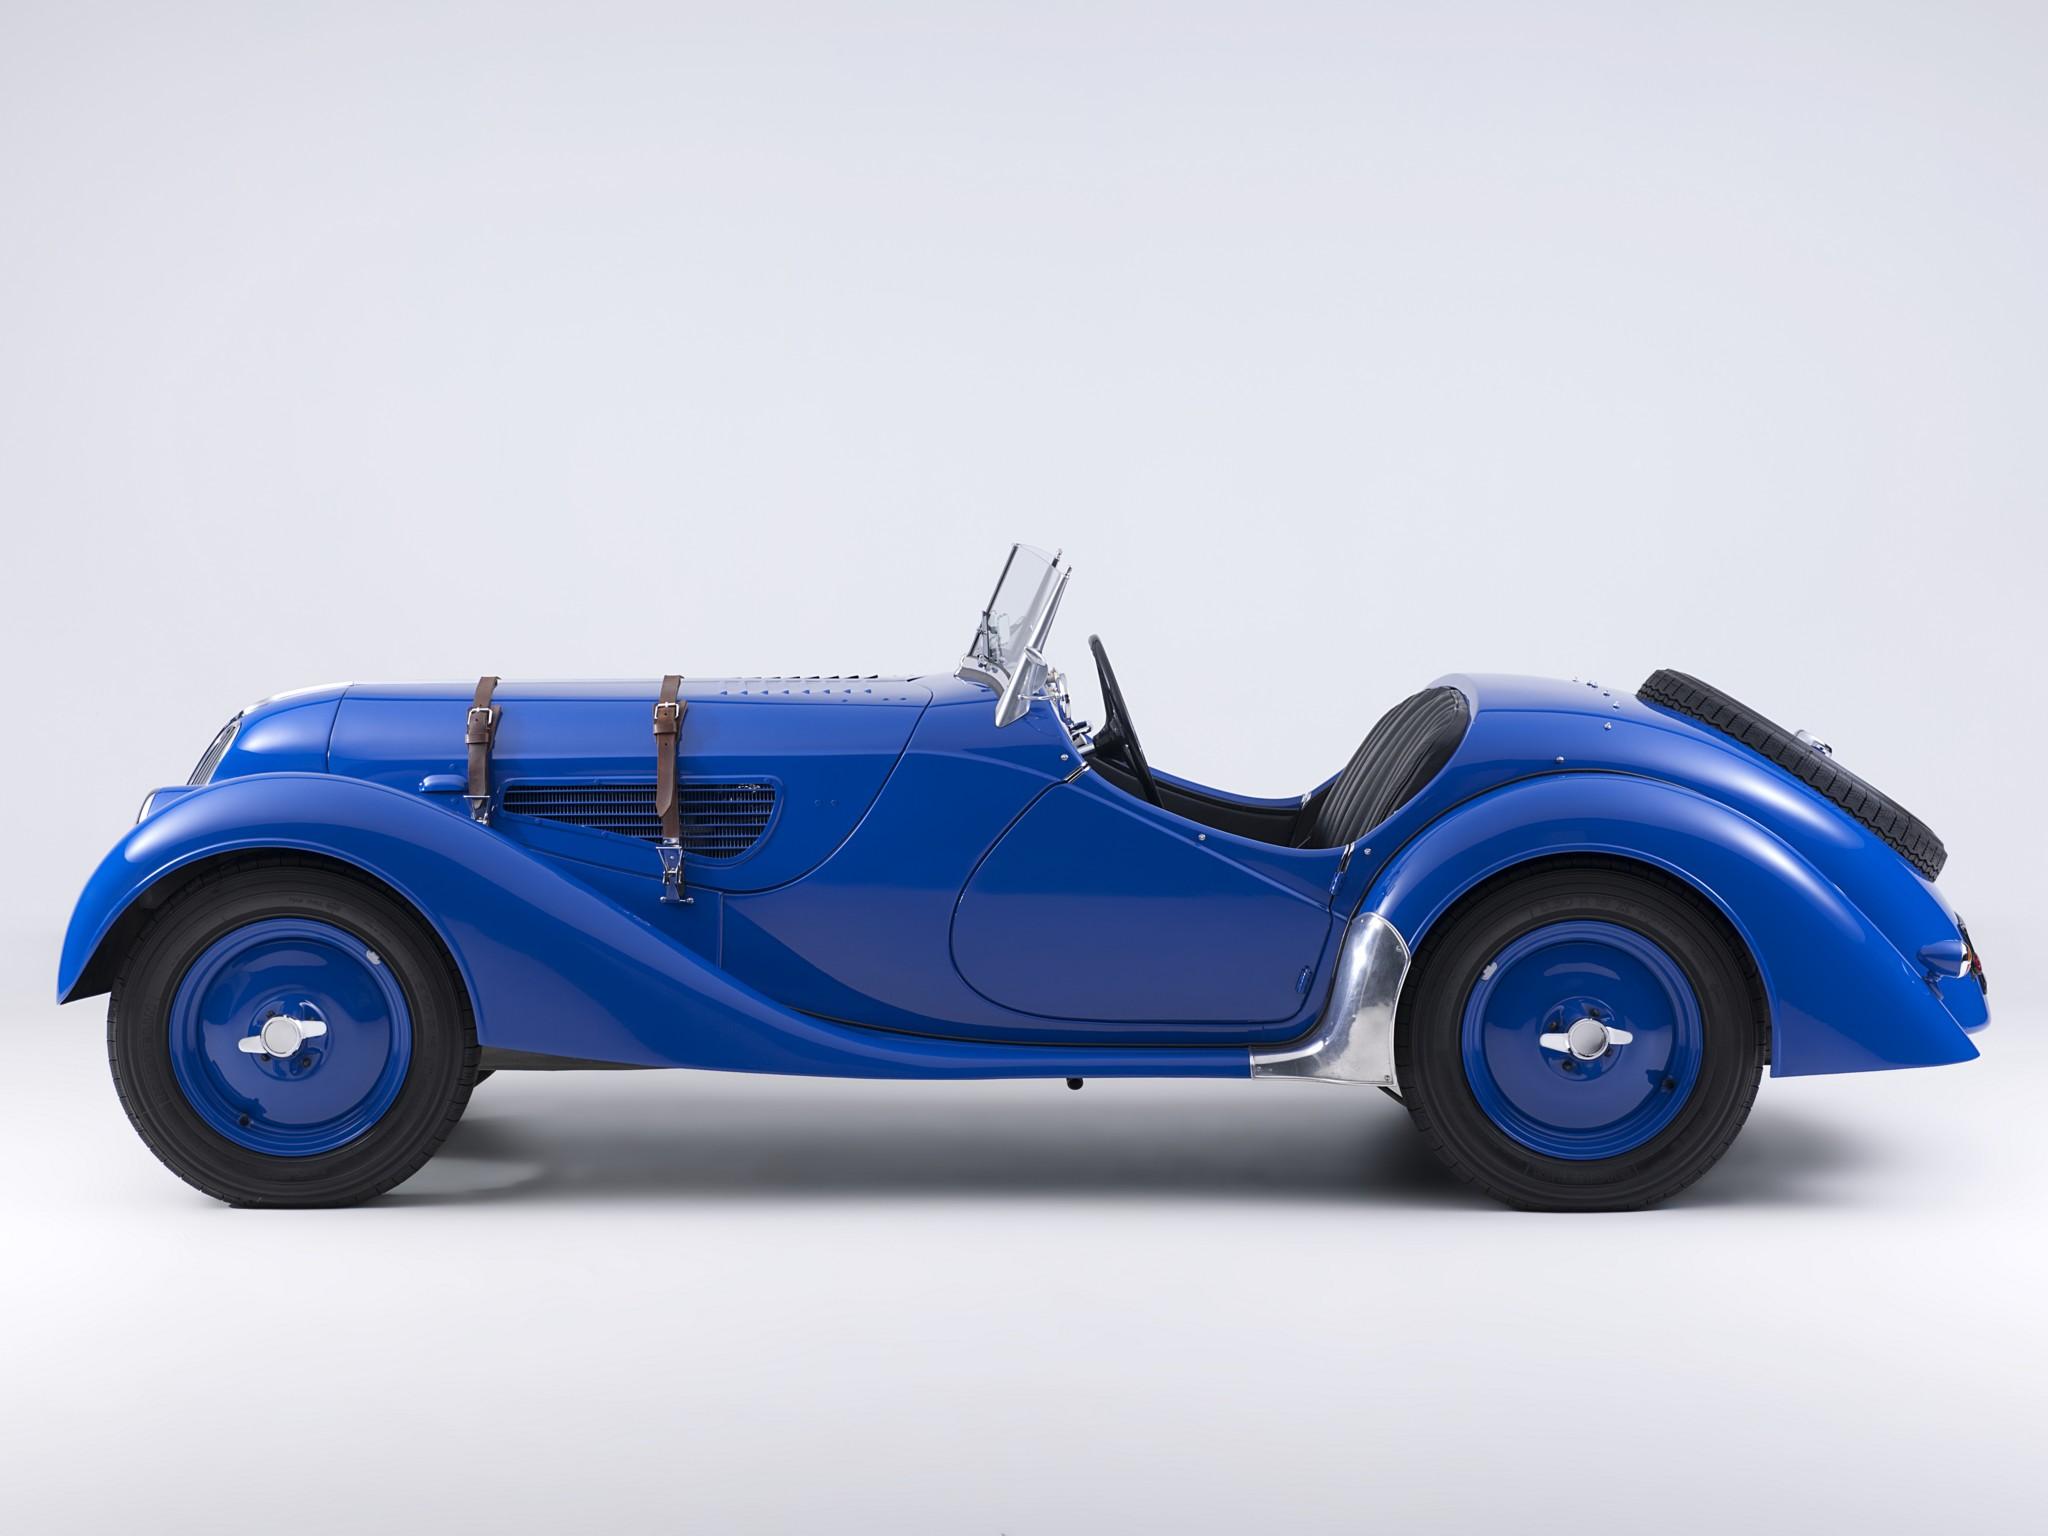 1936, Bmw, 328, Roadster, Retro Wallpapers HD / Desktop ...